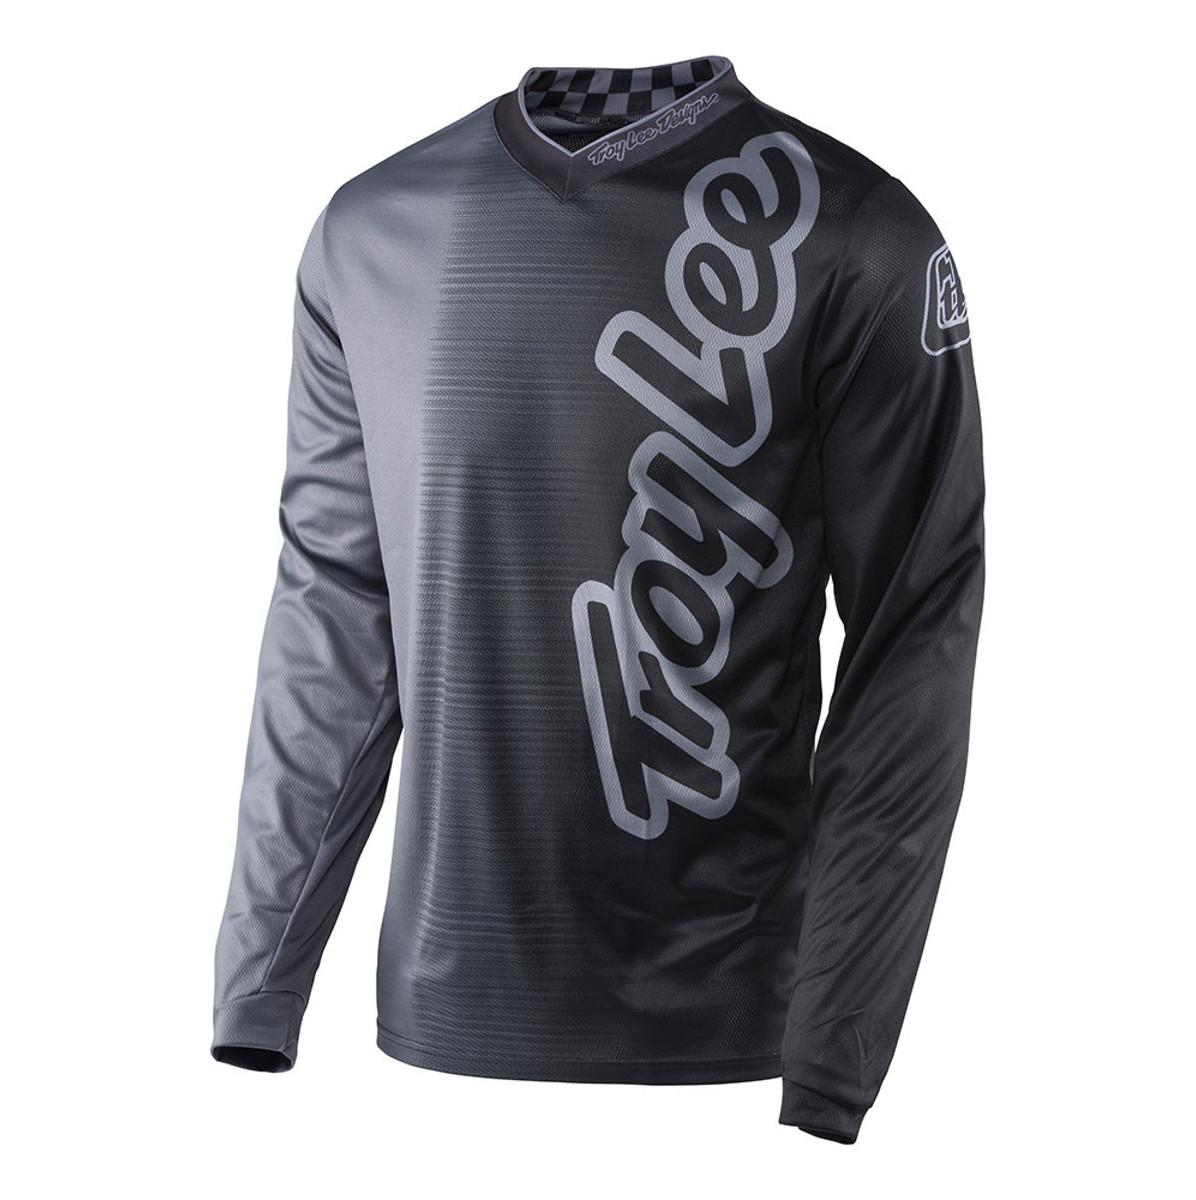 Troy Lee Designs GP 50/50 Jersey Troy Lee Designs GP 50/50 Gray